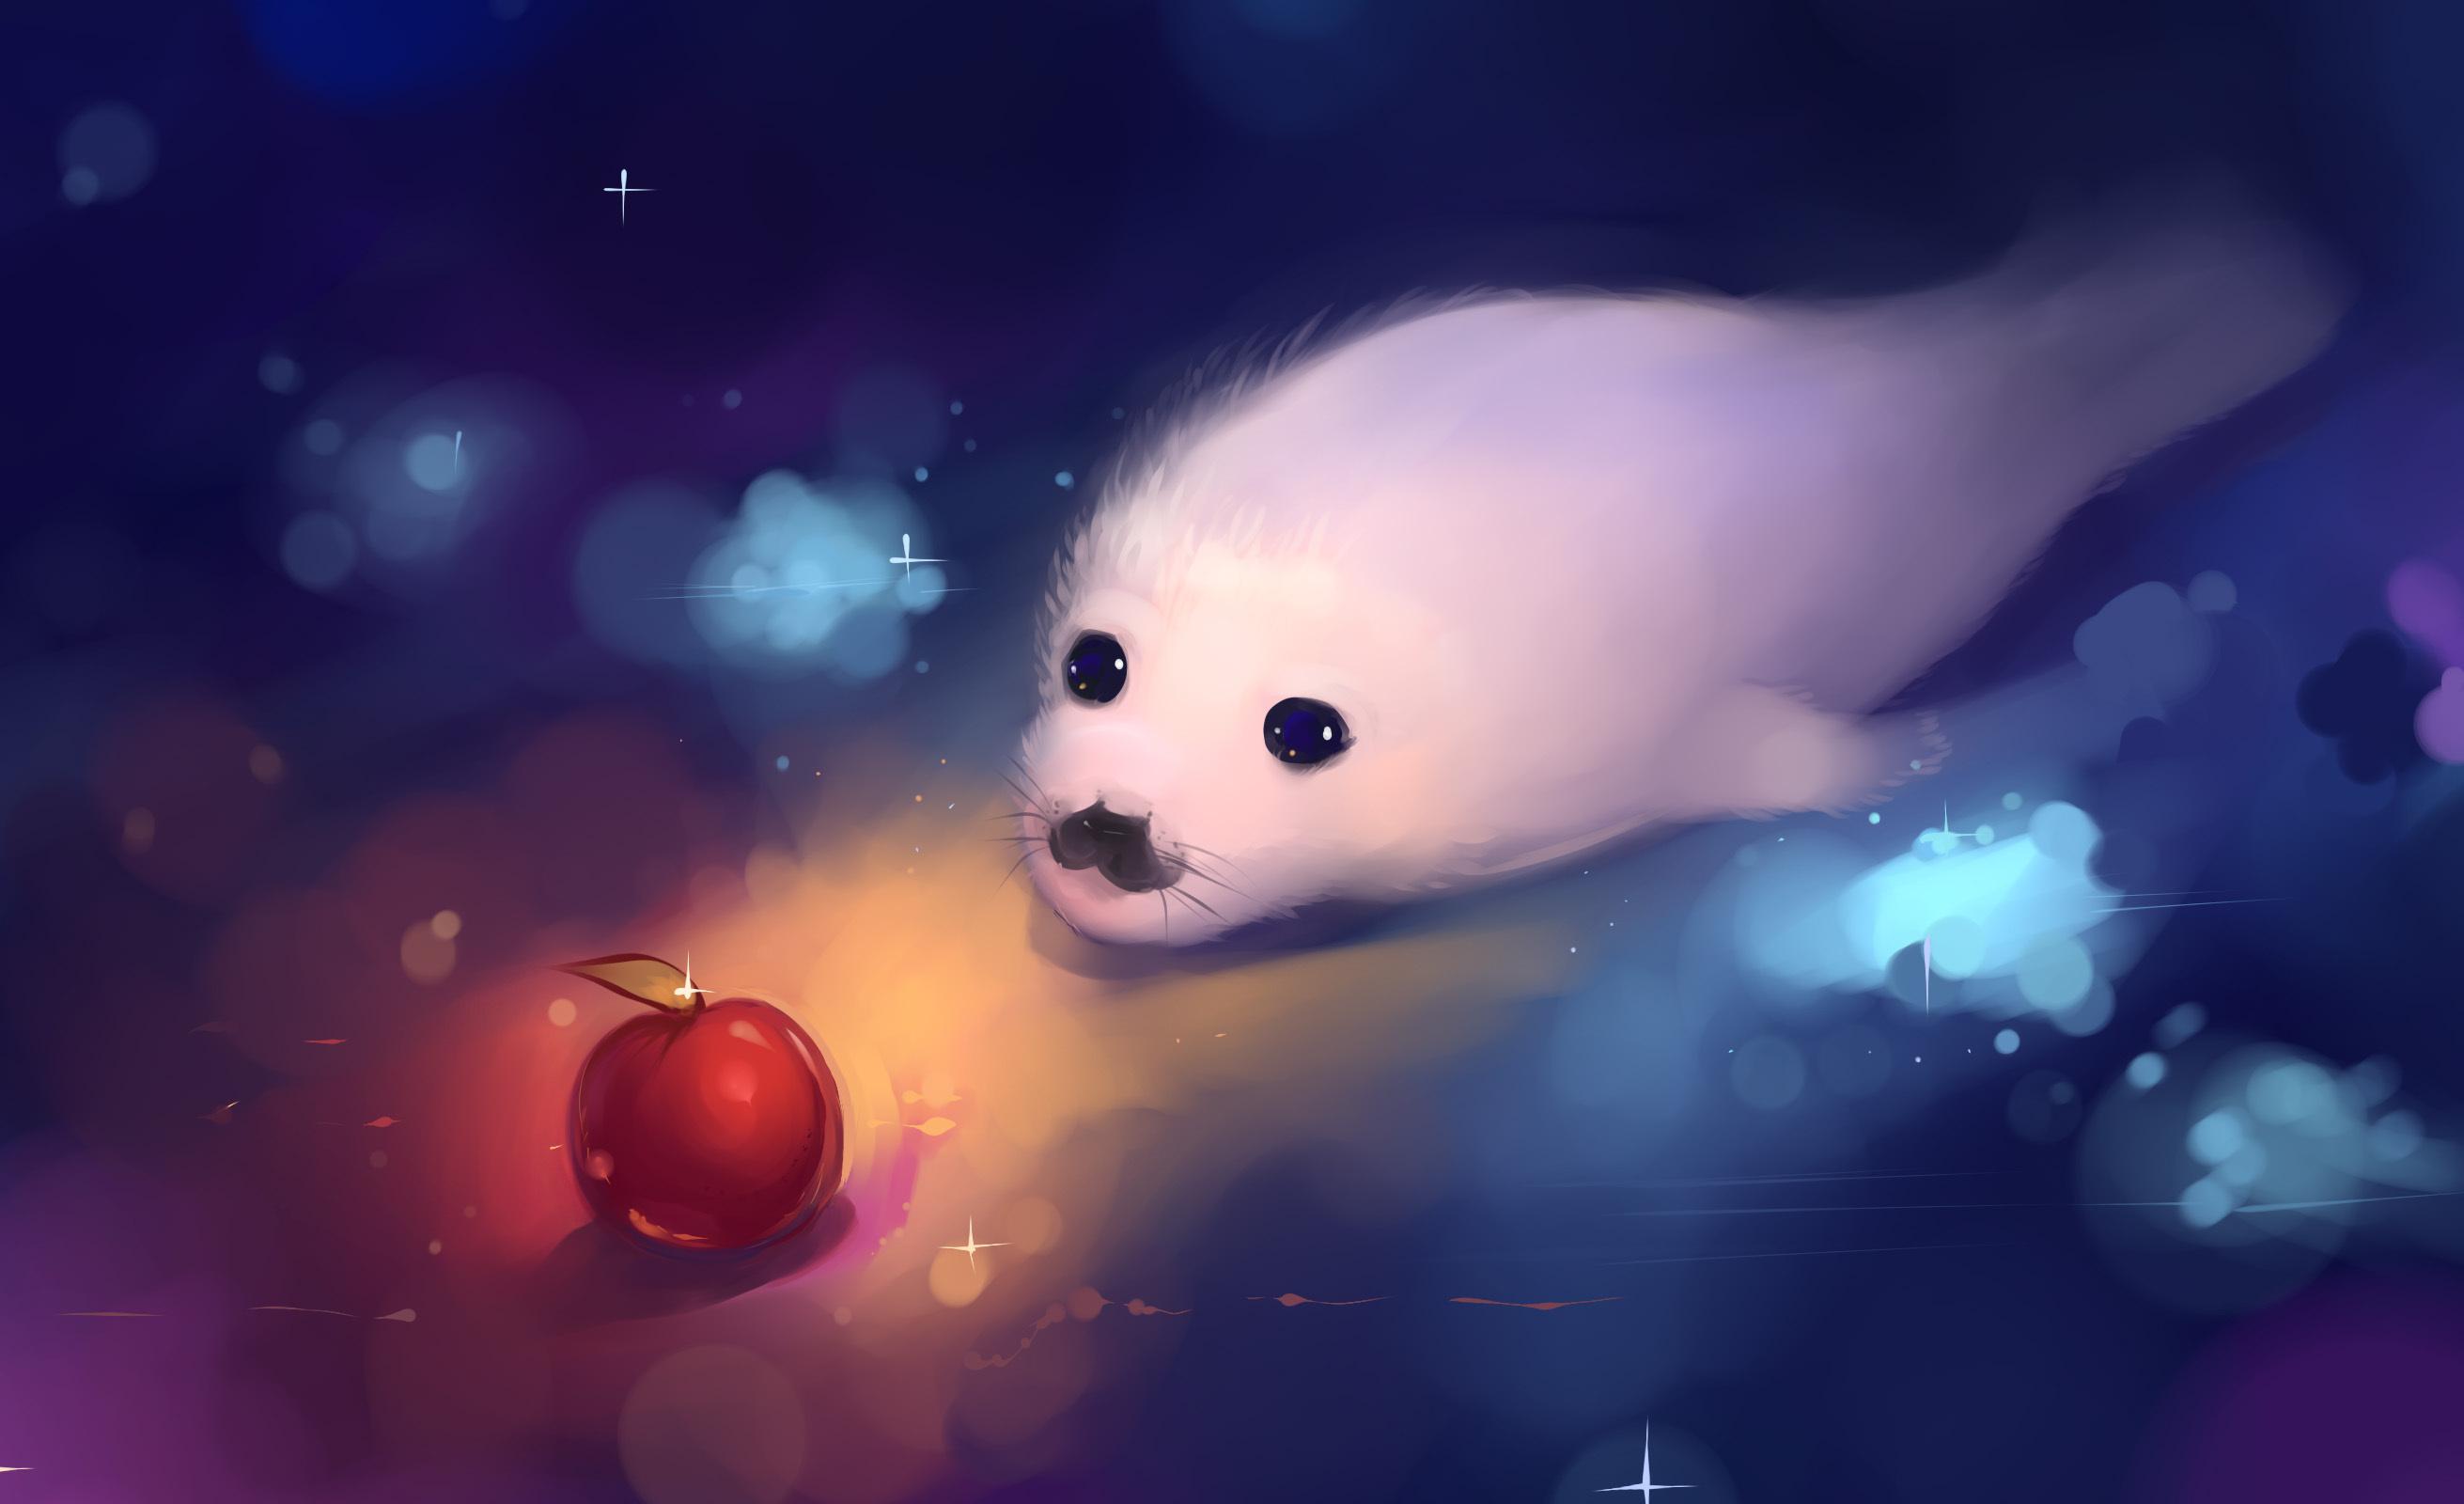 animal artistic cute seal puppy apple wallpaper